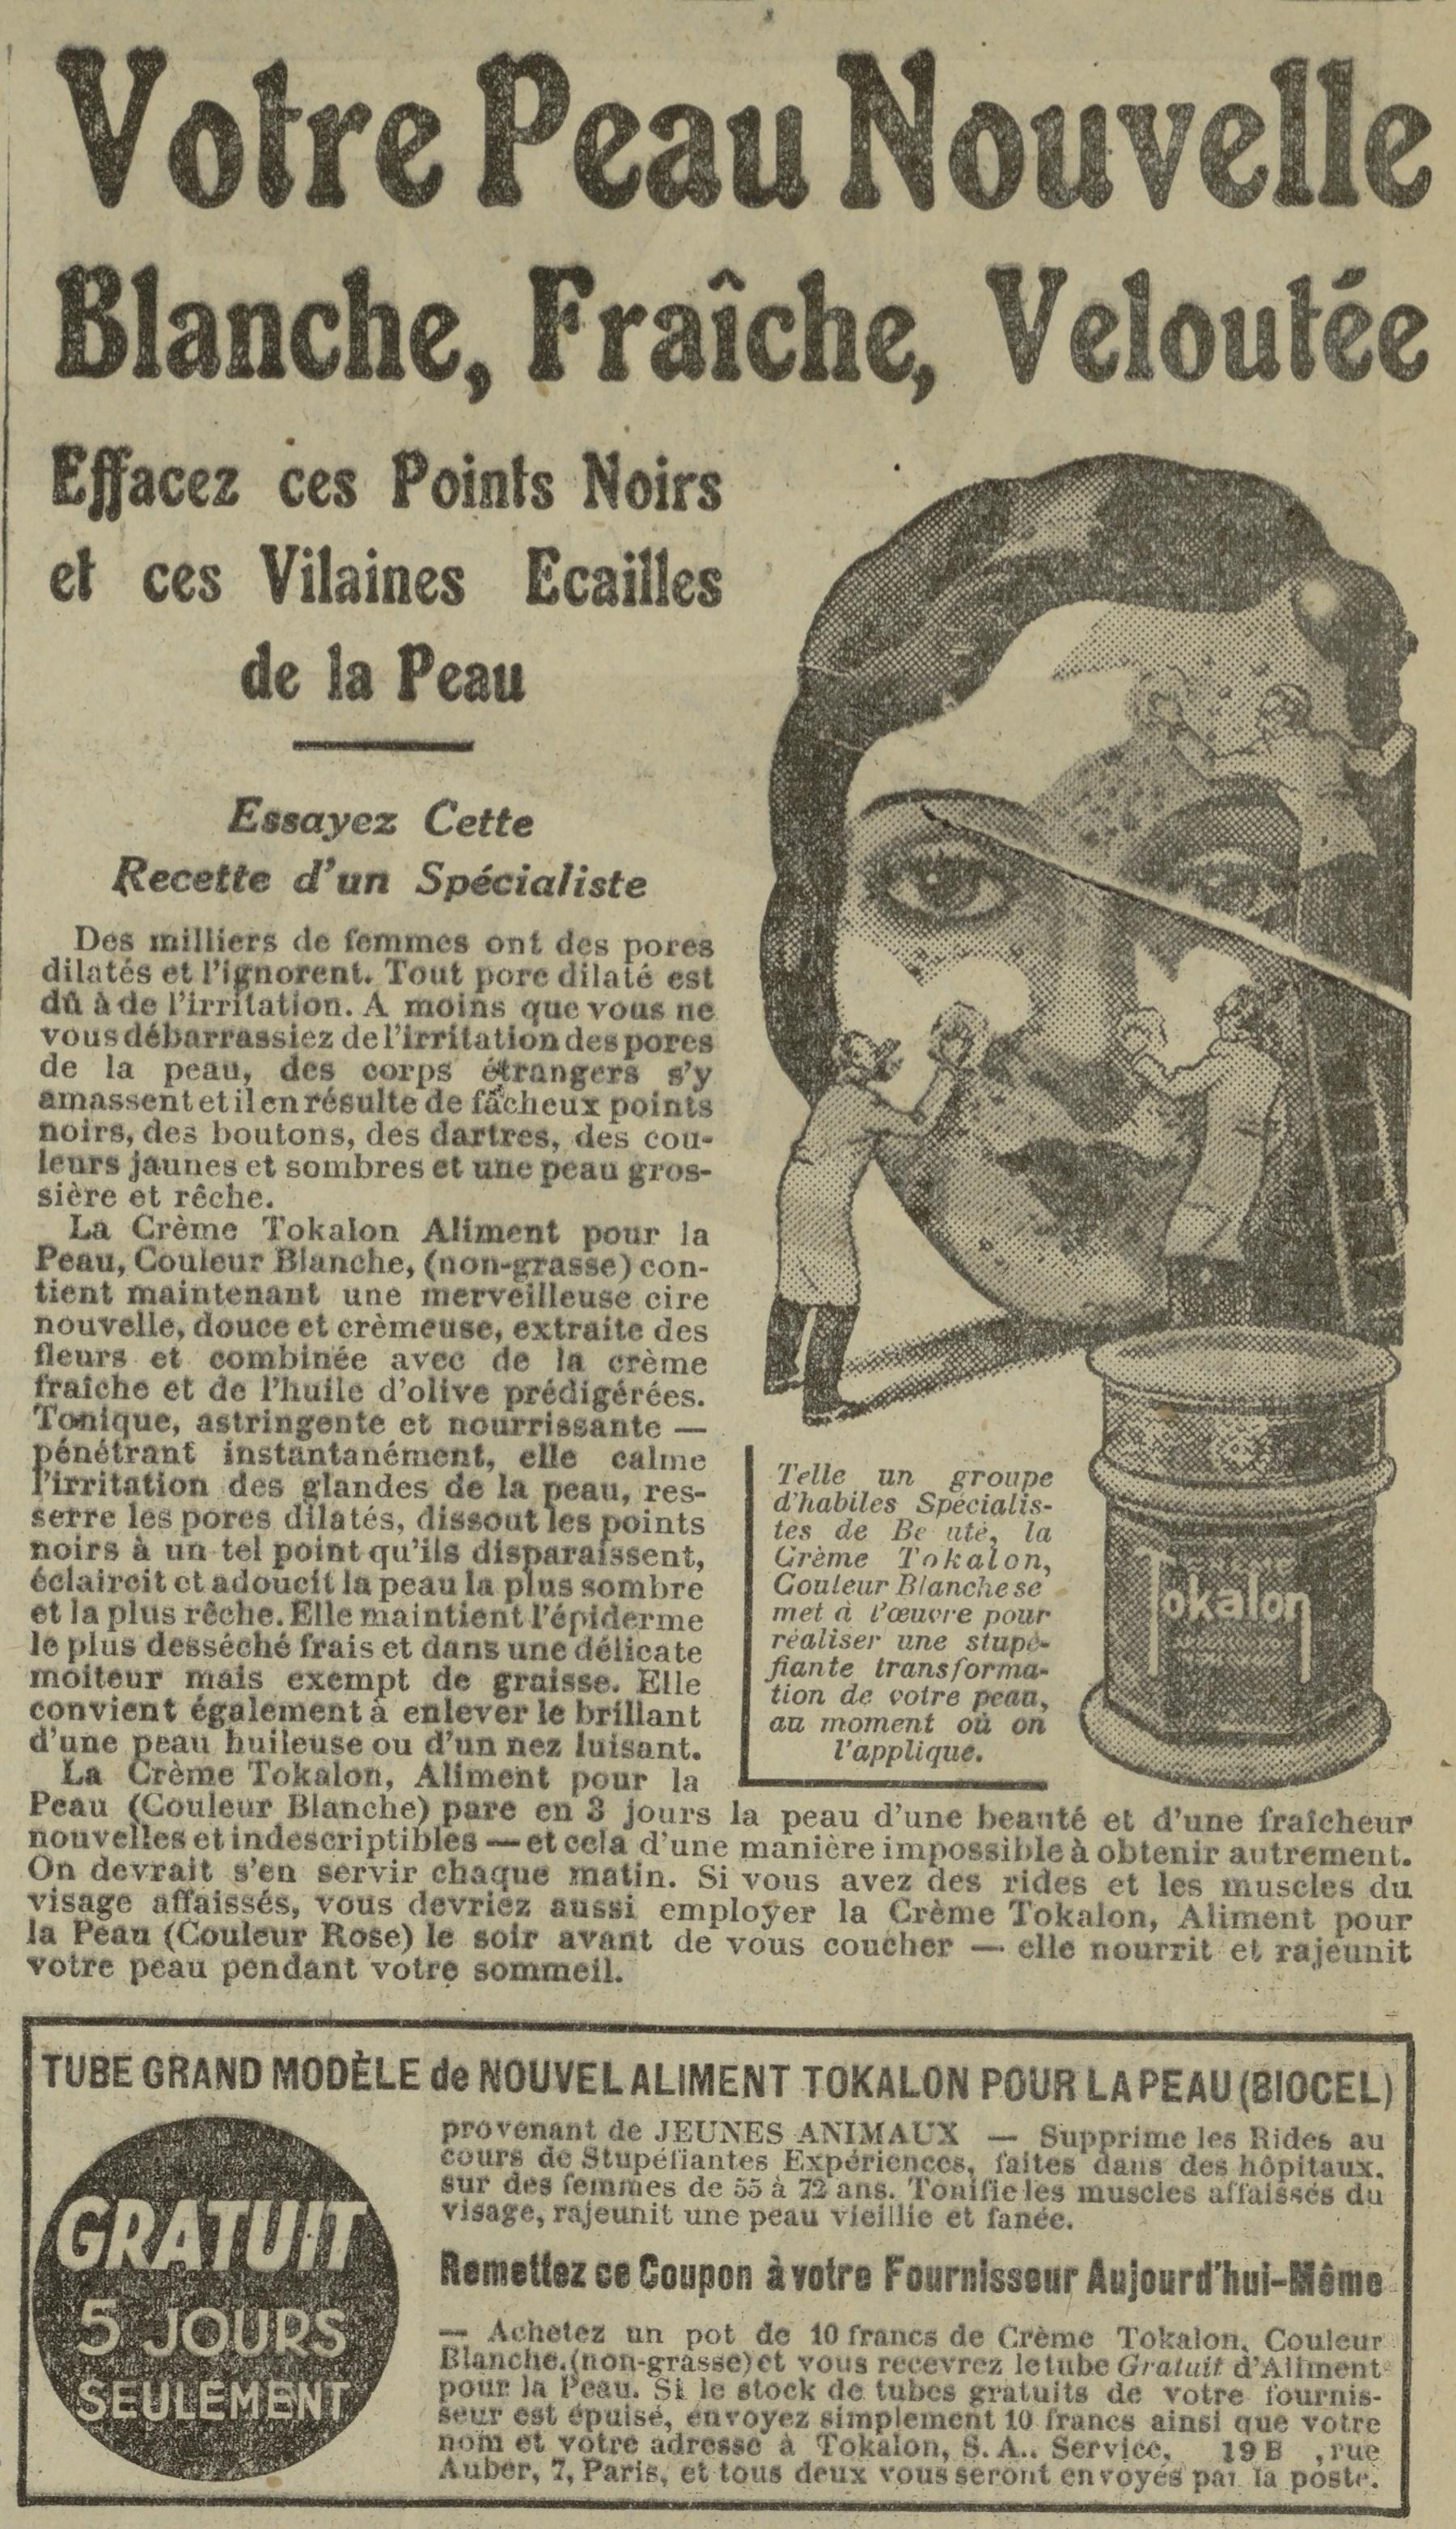 Contenu du Crème Tokalon